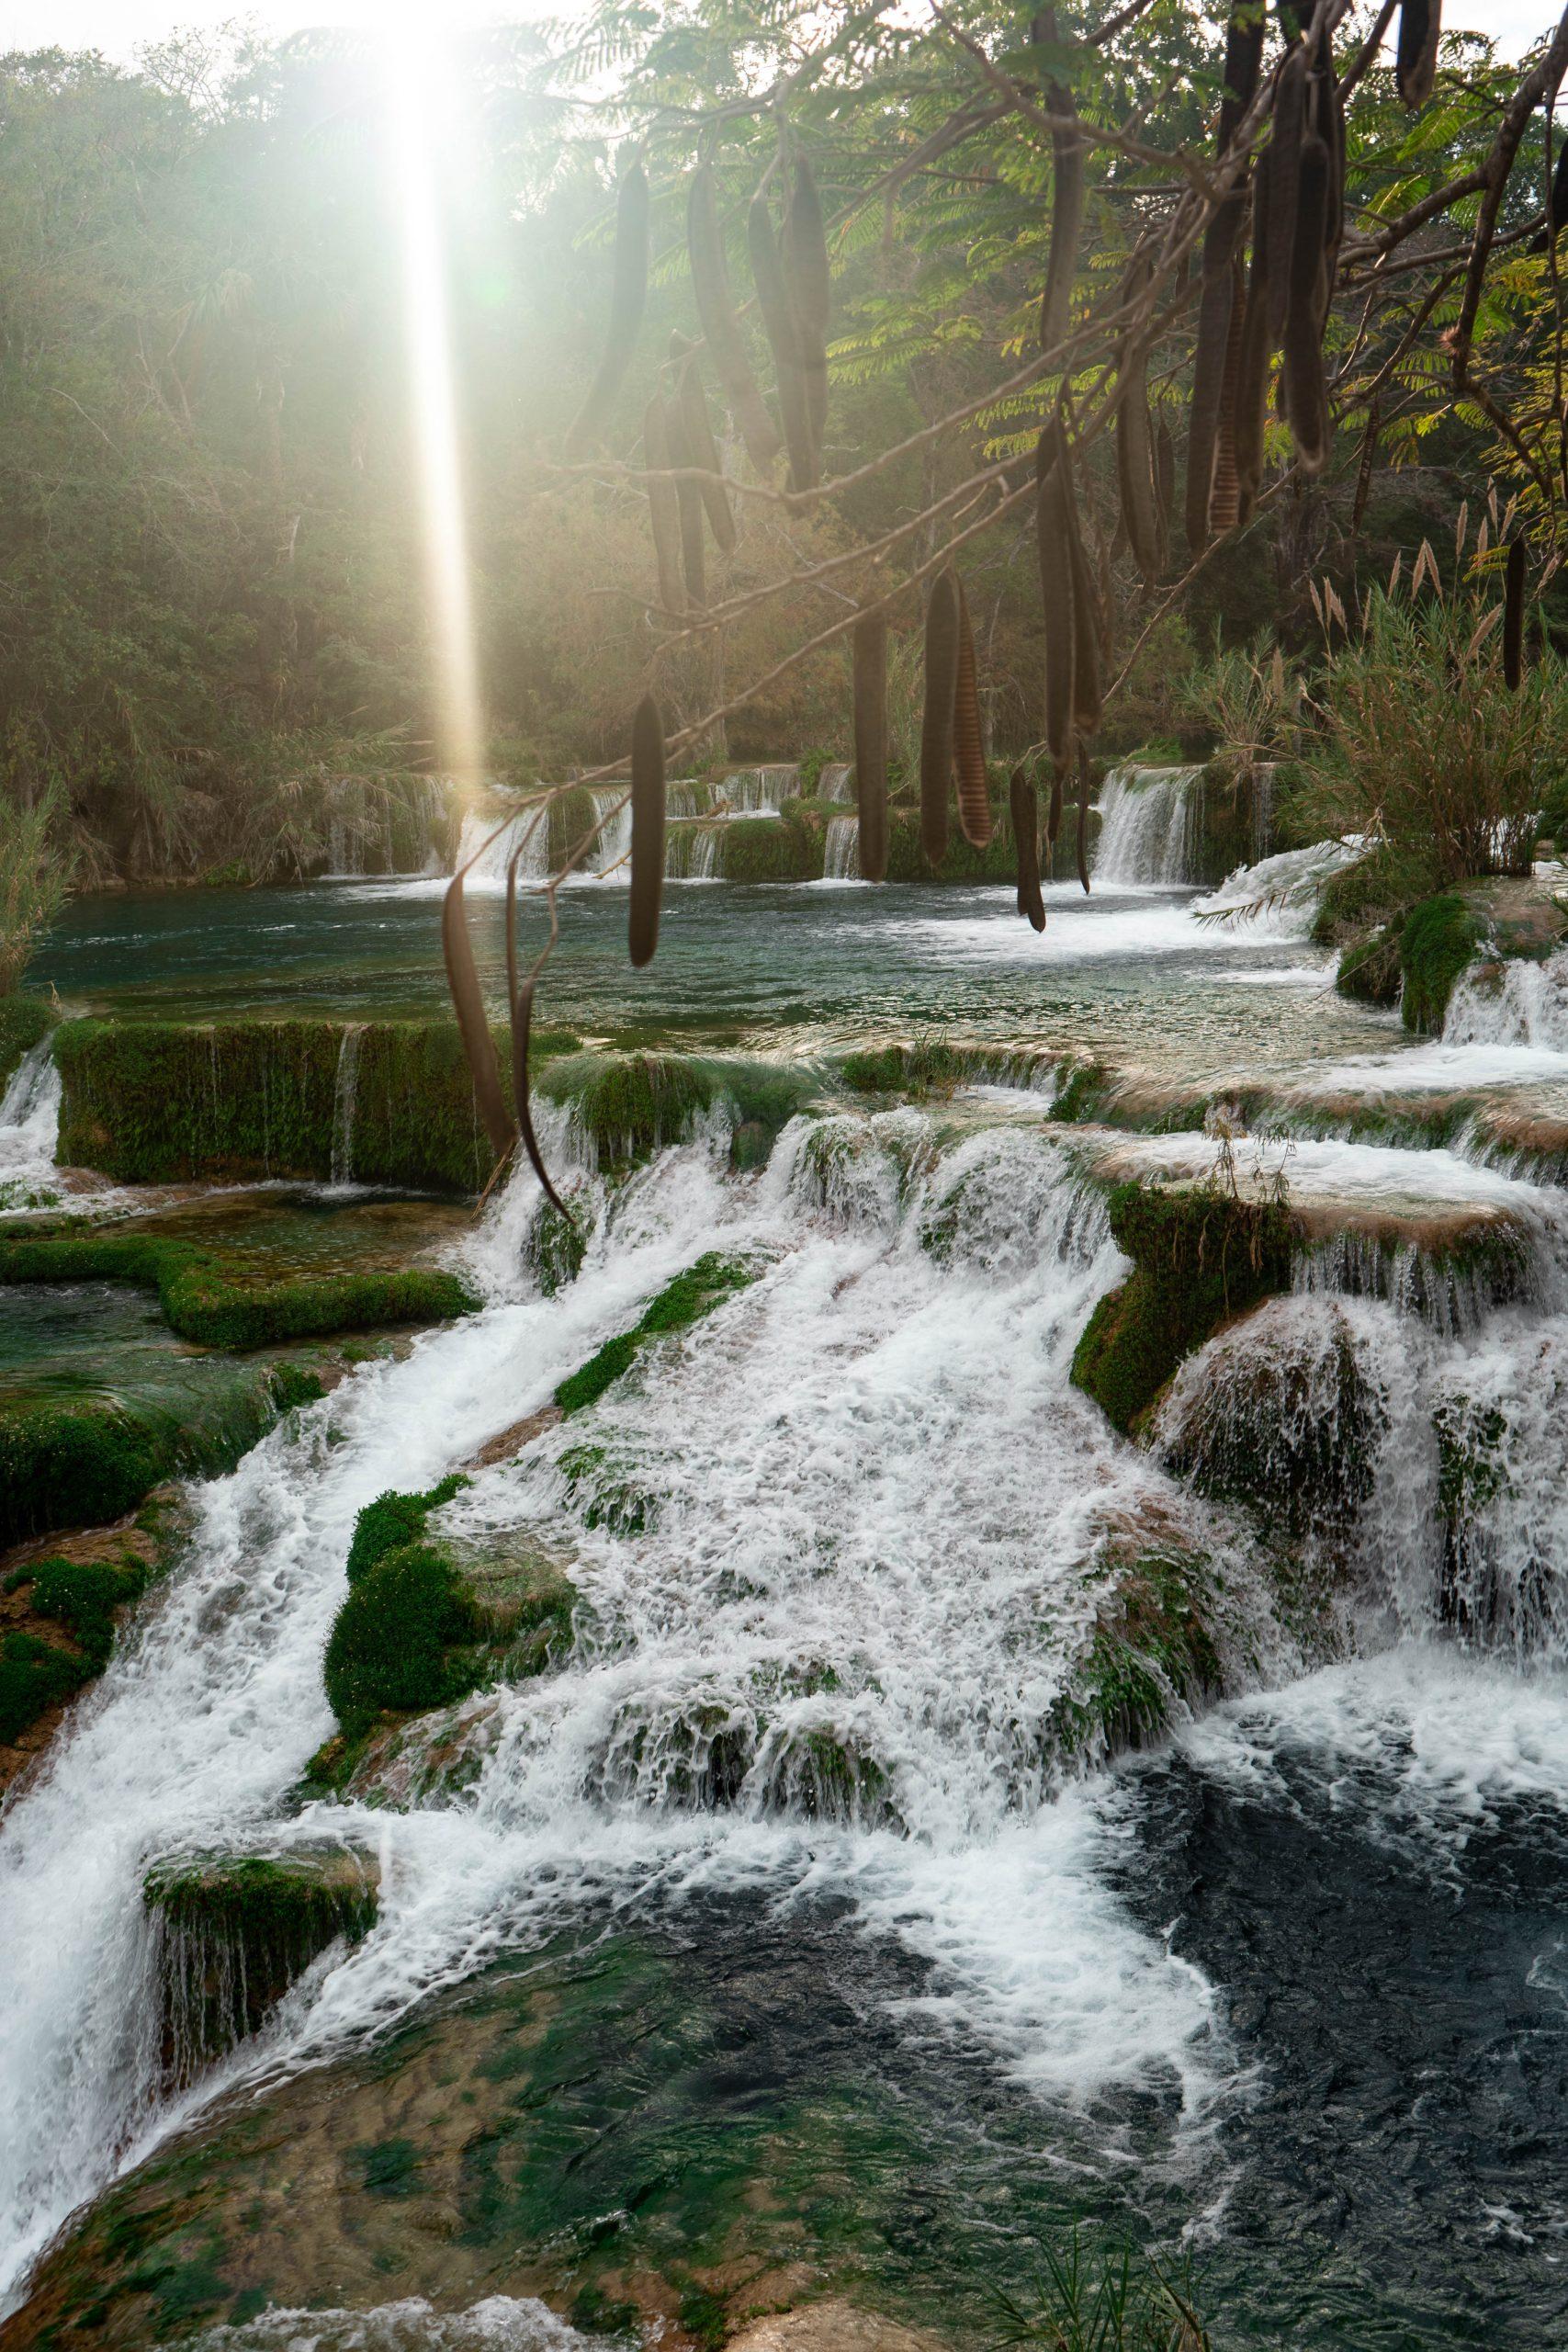 cascada el meco secret waterfall tamarind tree la huasteca potosina san luis potosi mexico